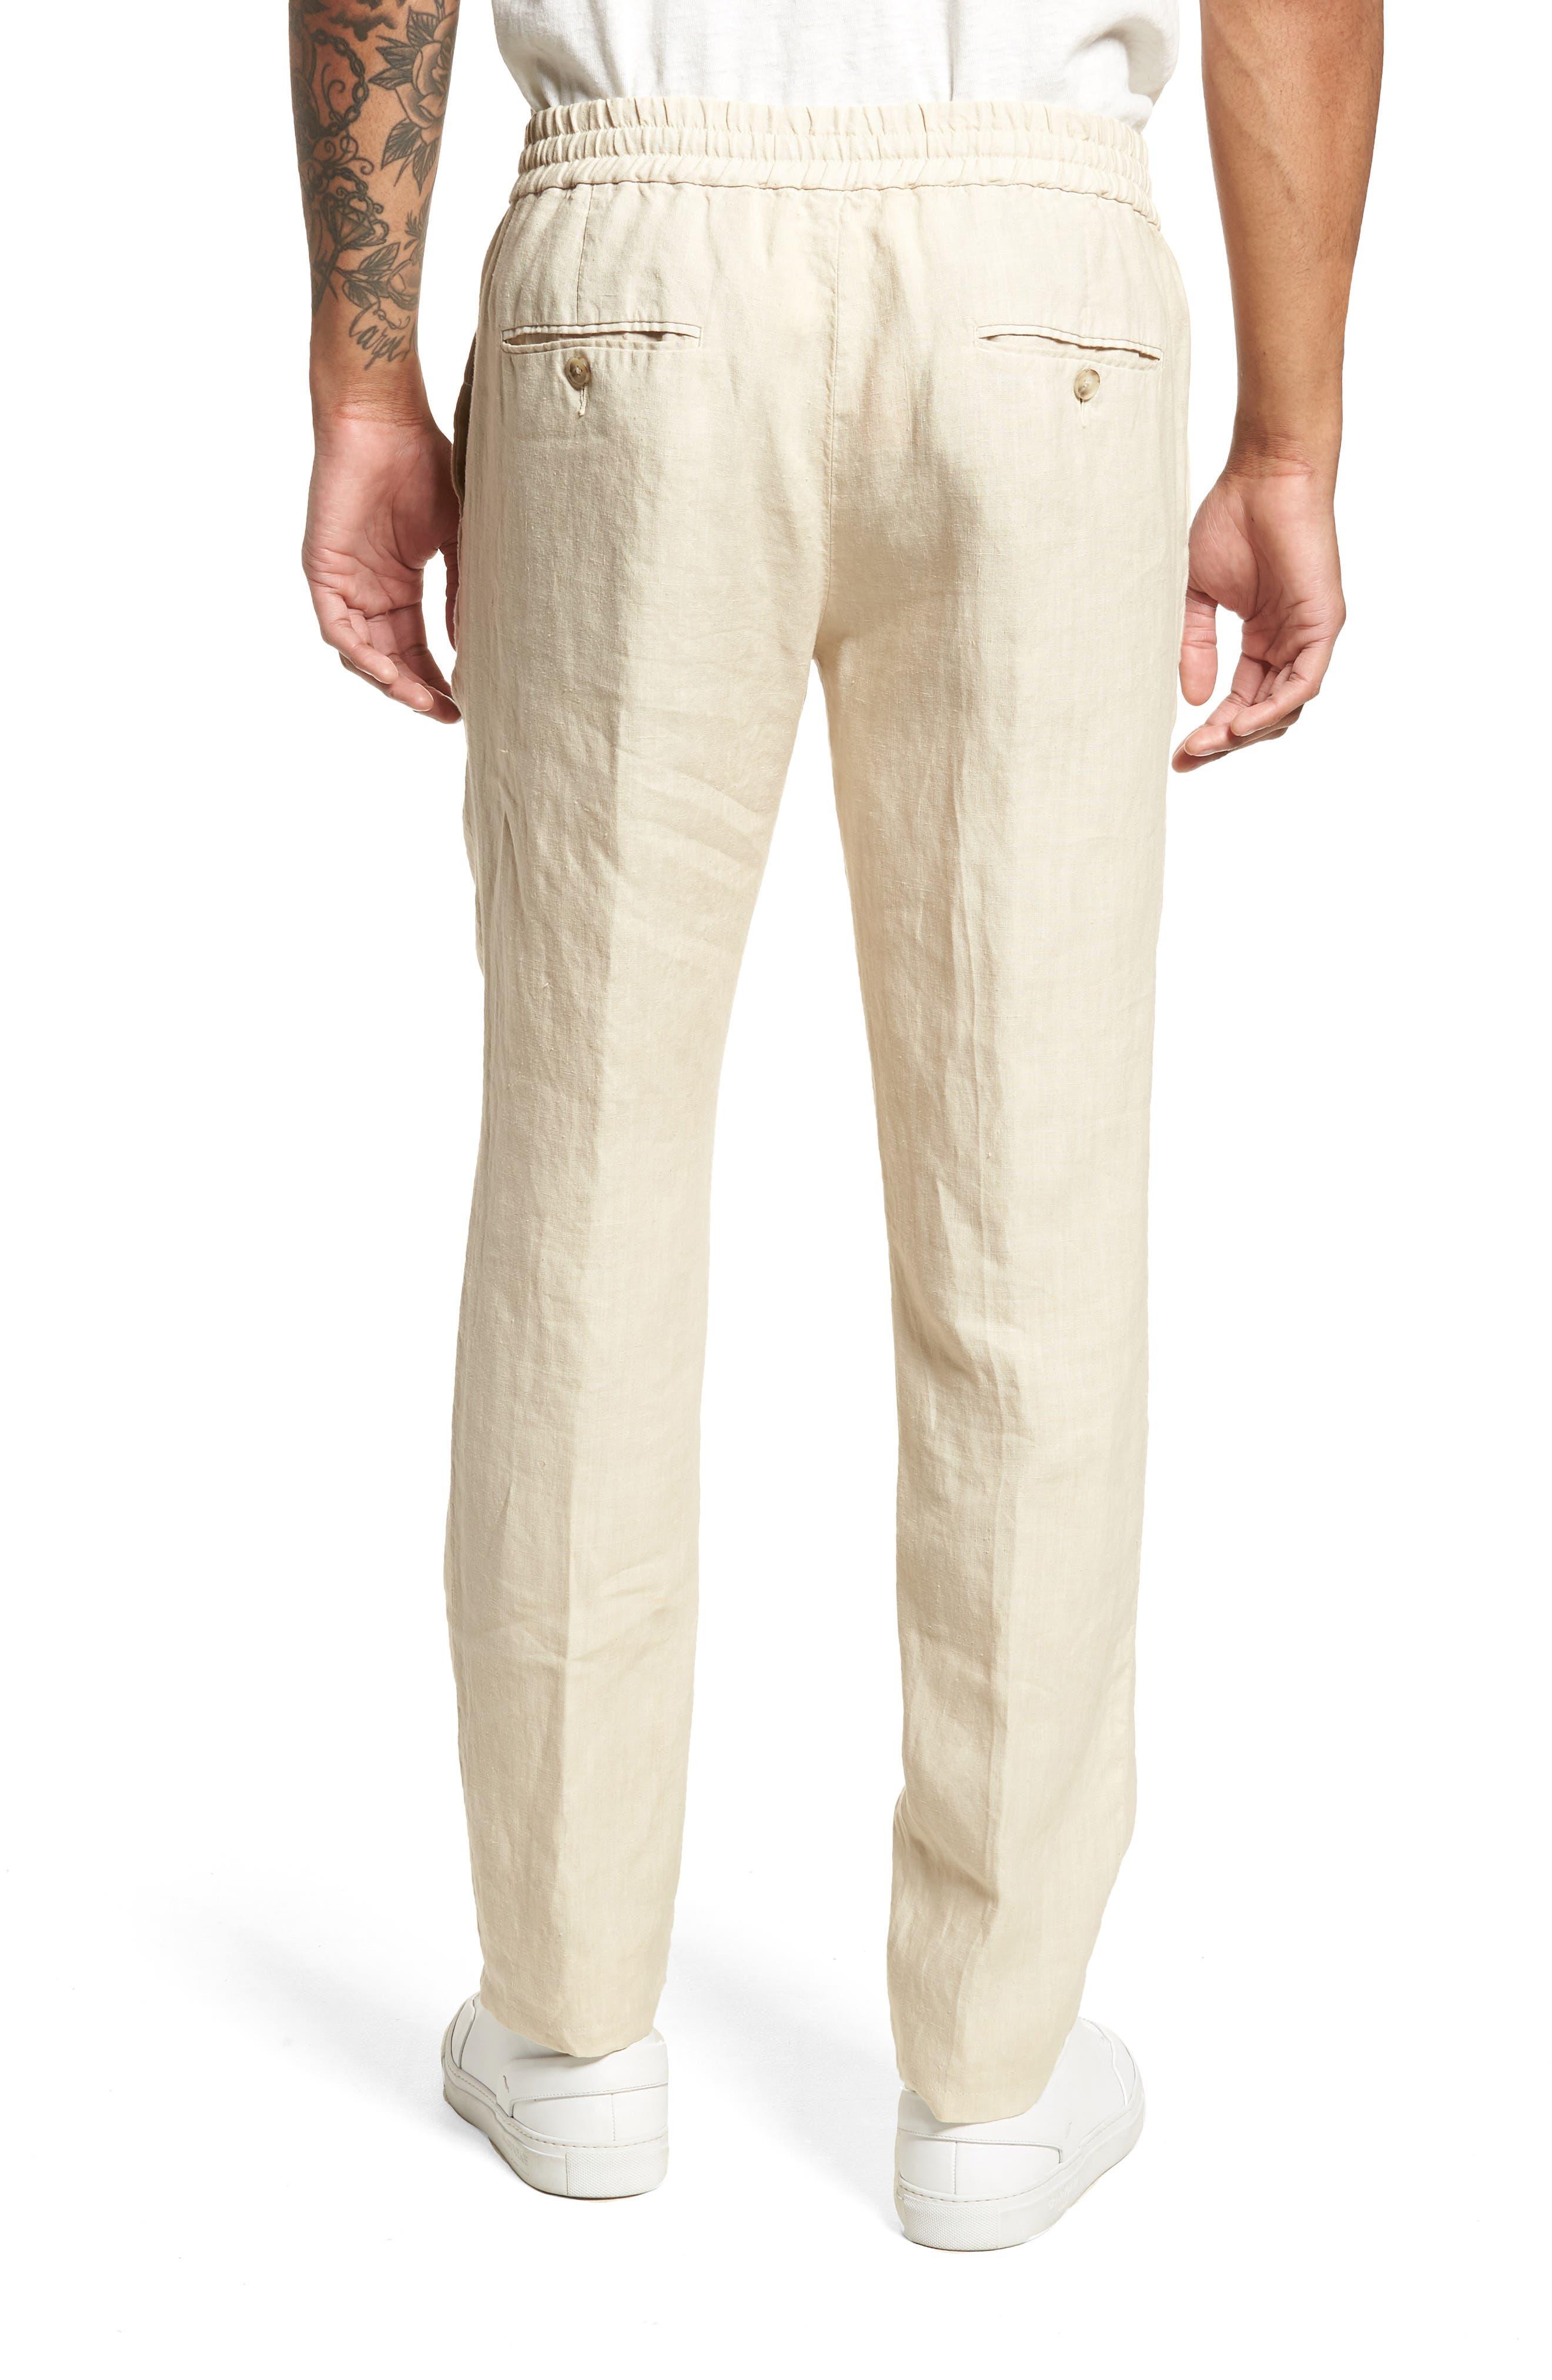 Pintuck Slim Fit Hemp Track Pants,                             Alternate thumbnail 2, color,                             WHITE SAND